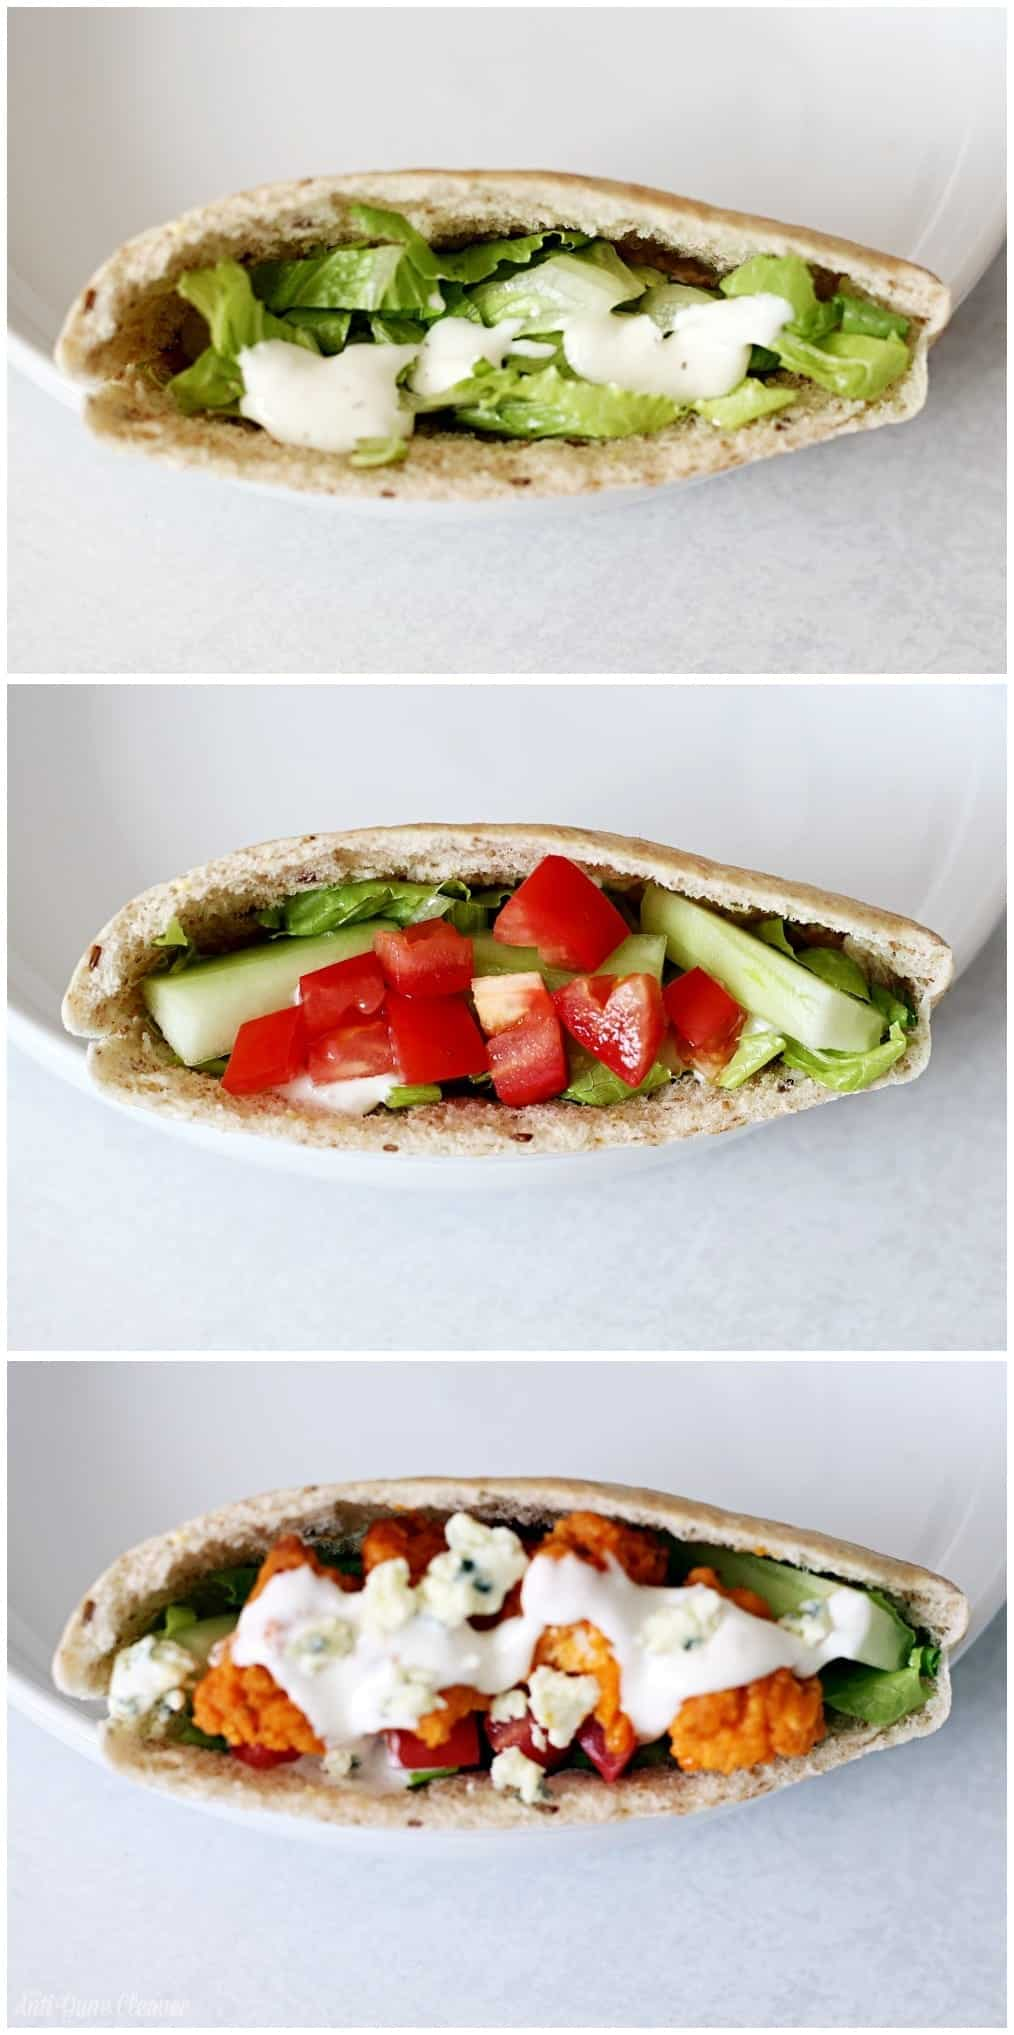 Fast and Easy Buffalo Chicken Pita Sandwich Recipe #MomsWingMan (ad)